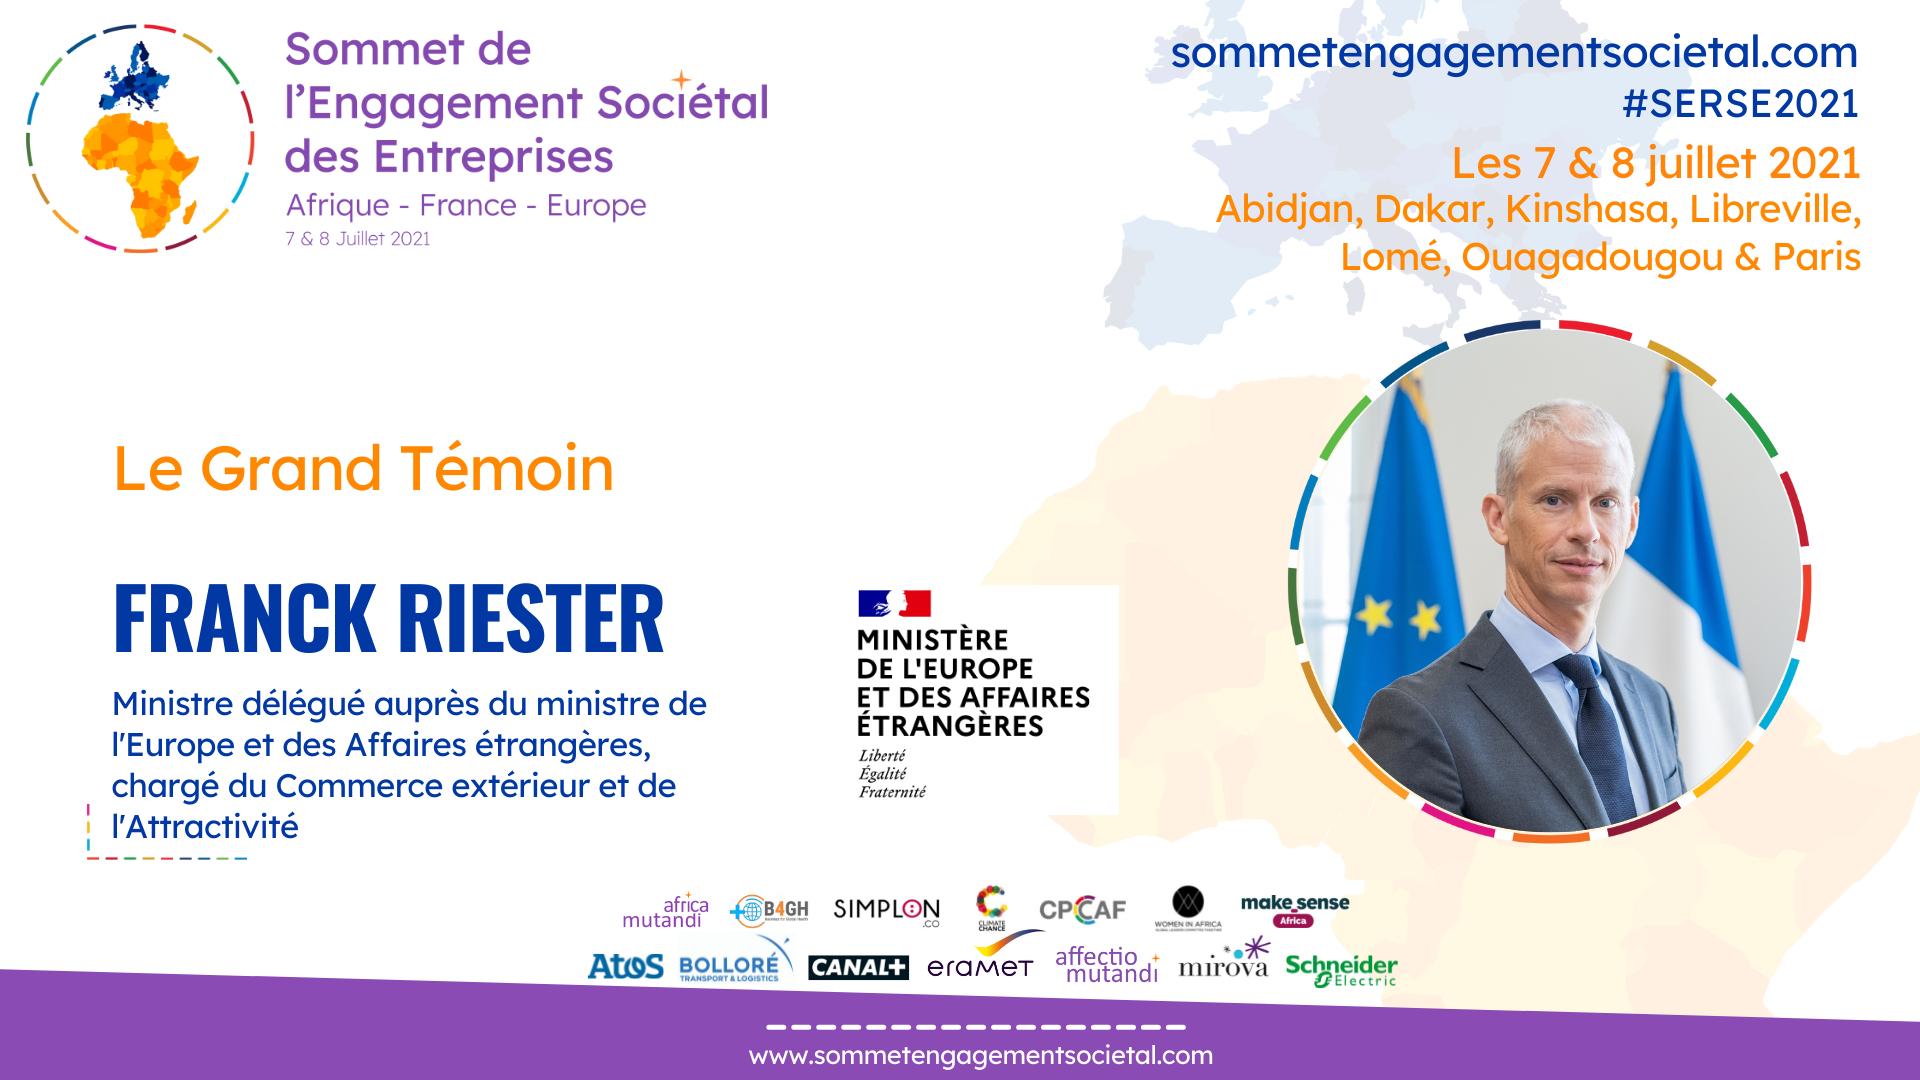 Franck Riester, Grand Témoin du Sommet de l'Engagement Sociétal